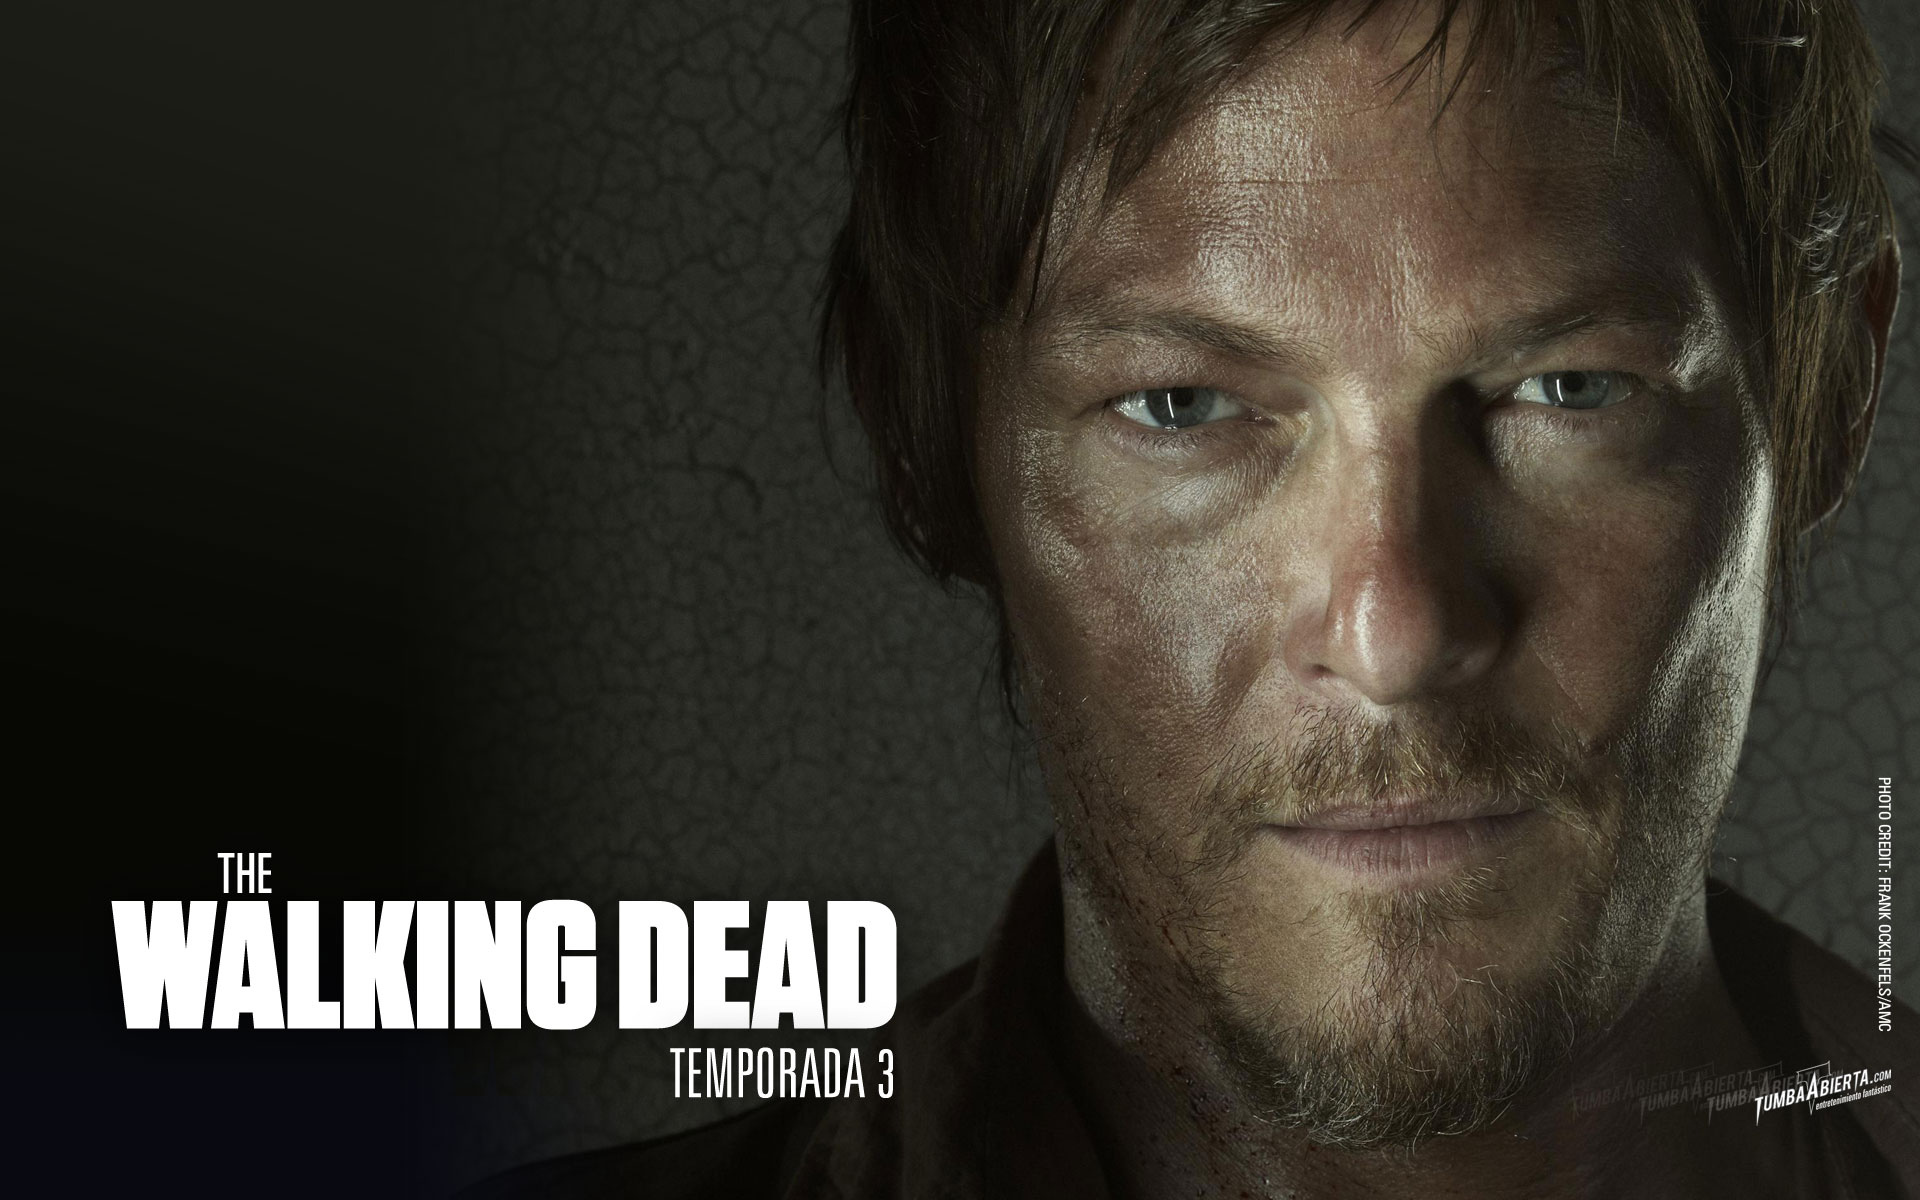 Wallpaper The Walking Dead T3 Hd Daryl Dixonjpg